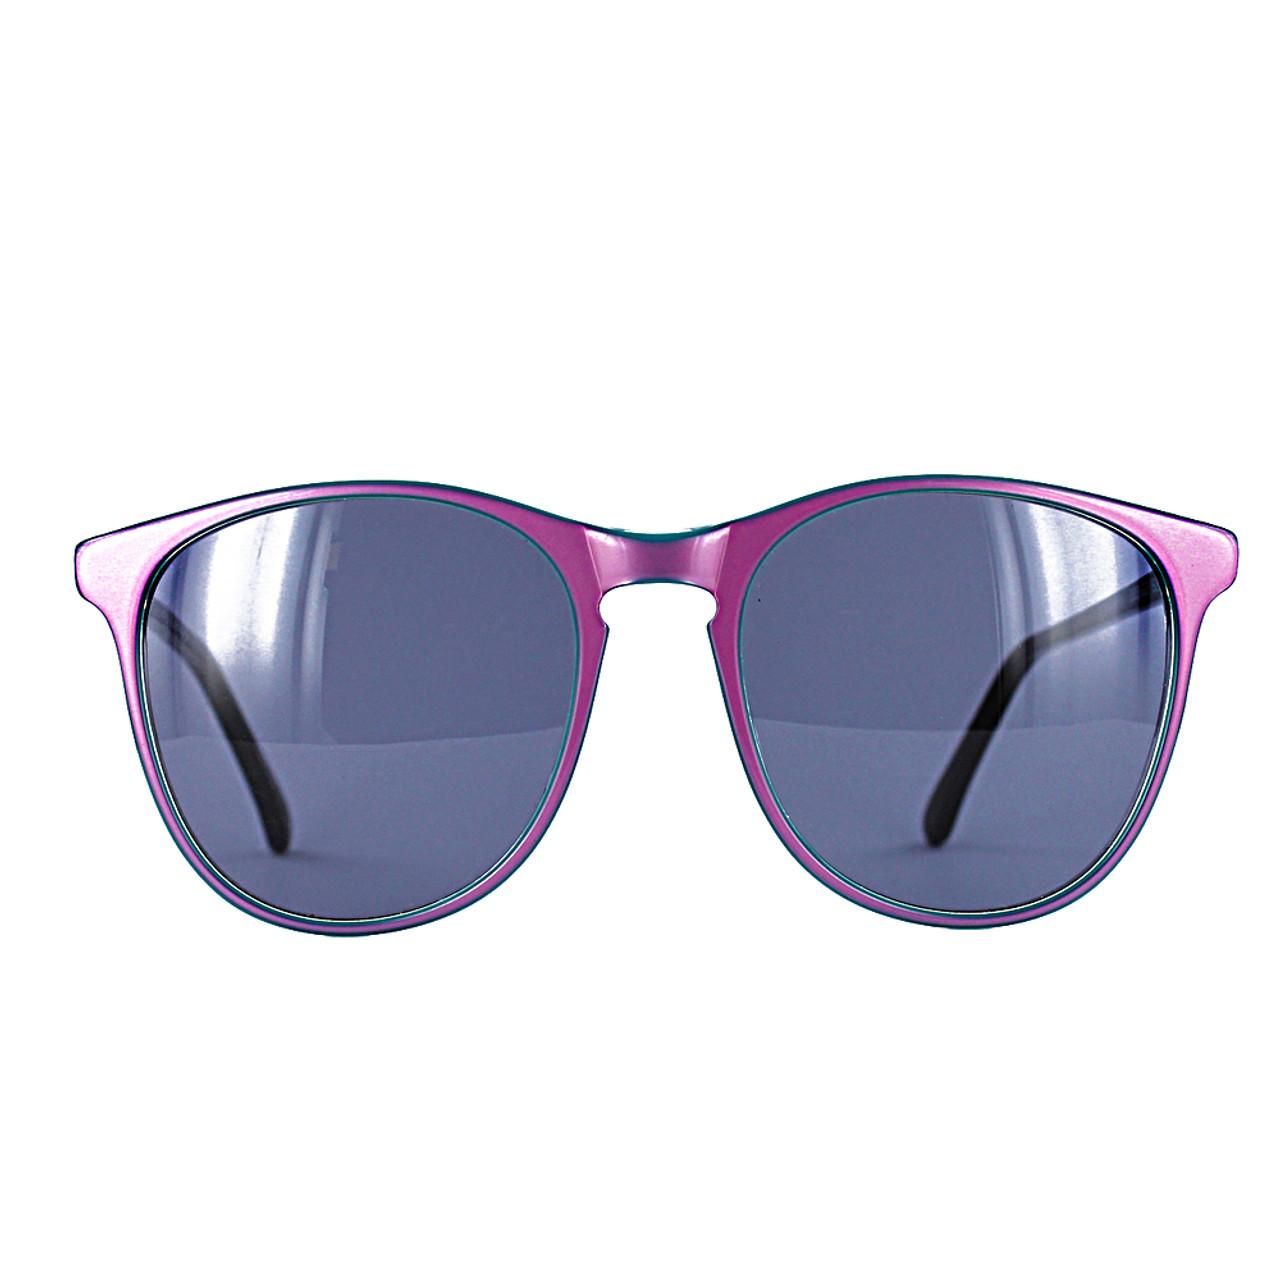 GEEK COUTURE® Ciel Eyeglasses or Sunglasses